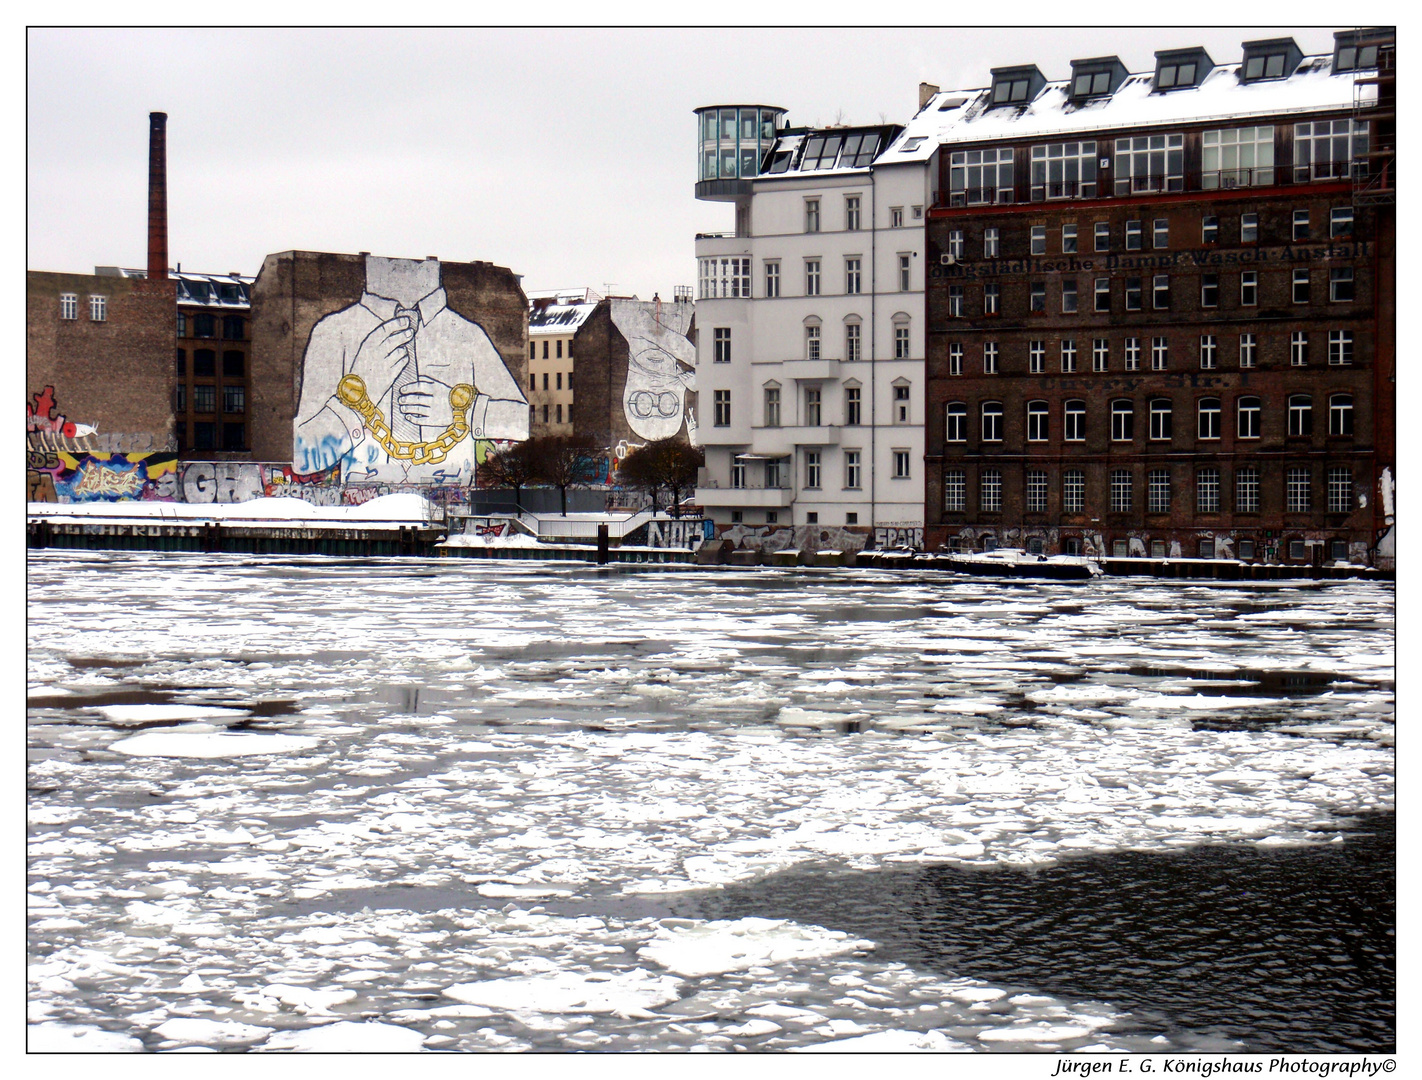 BERLIN 2010 +